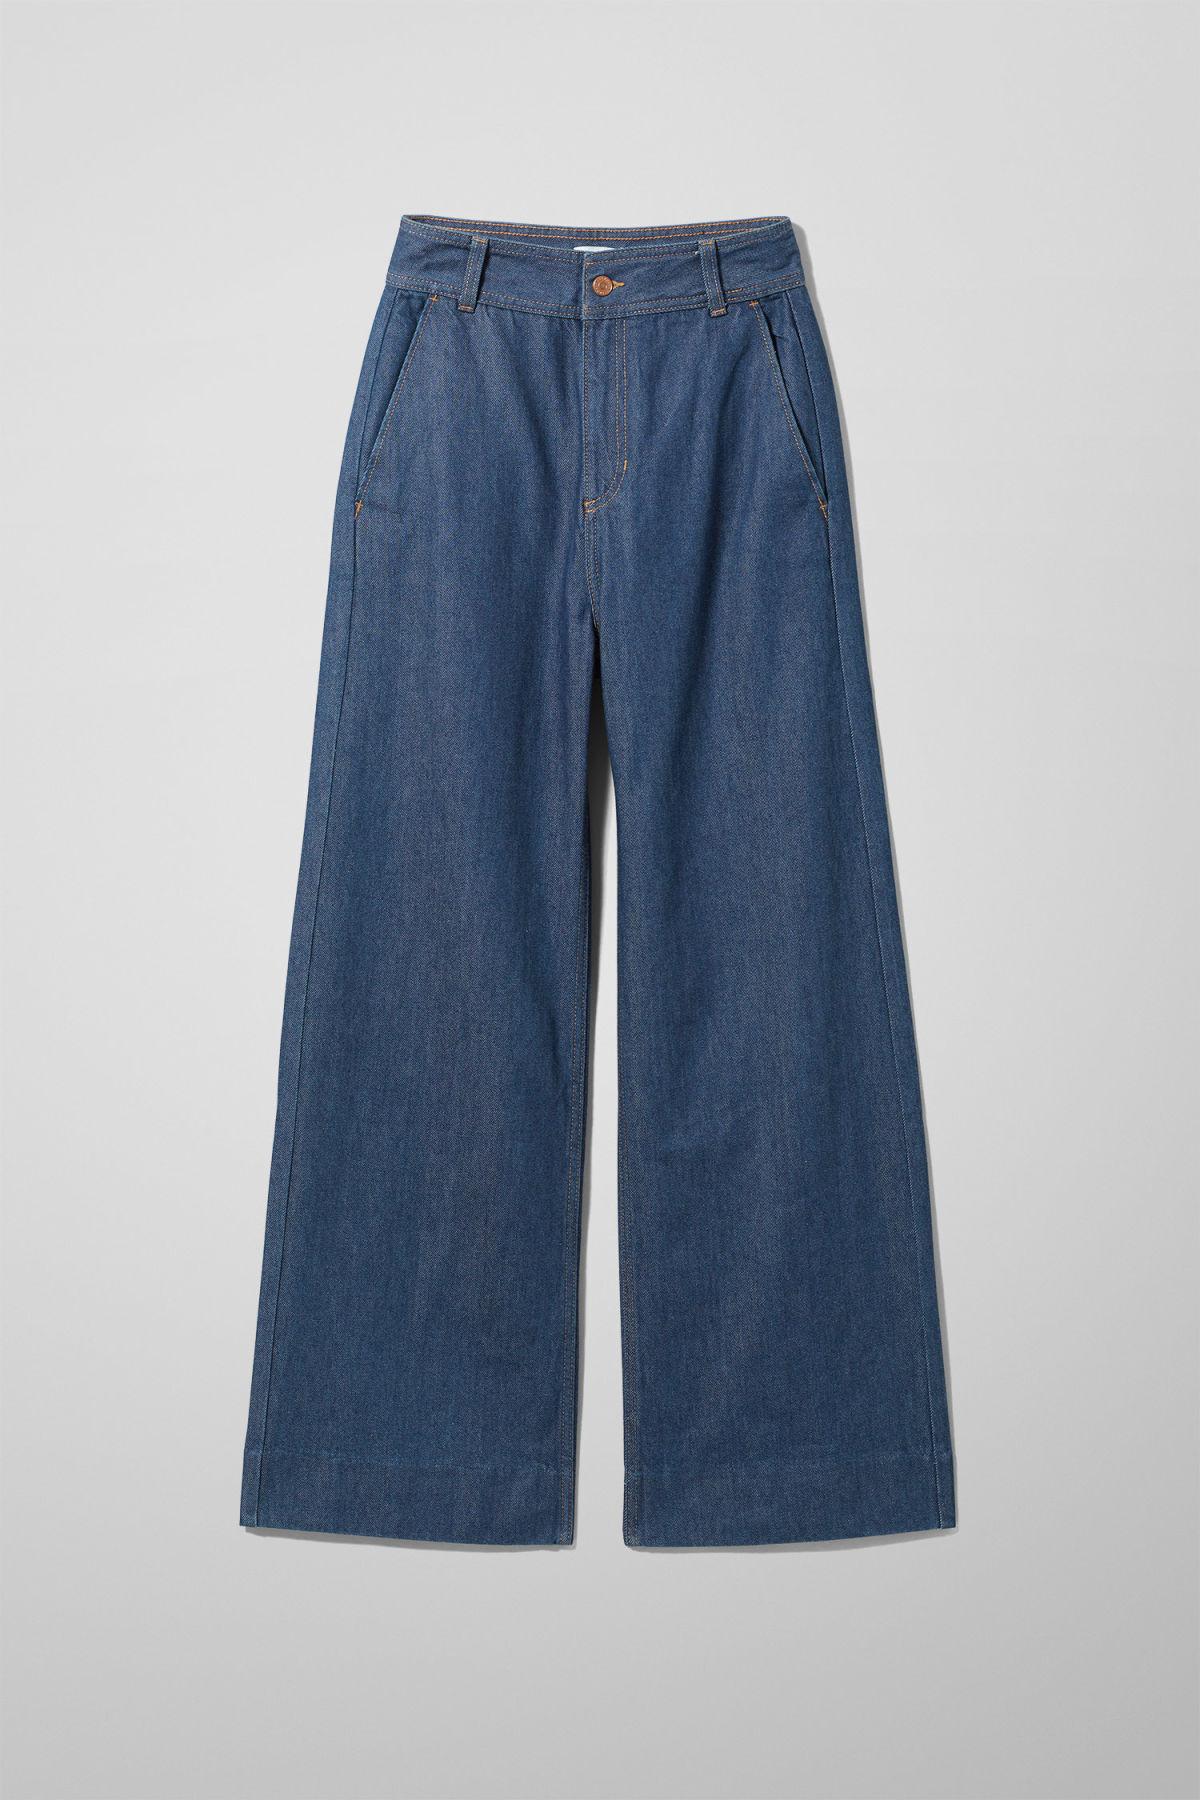 Cory Denim Trousers - Blue-36